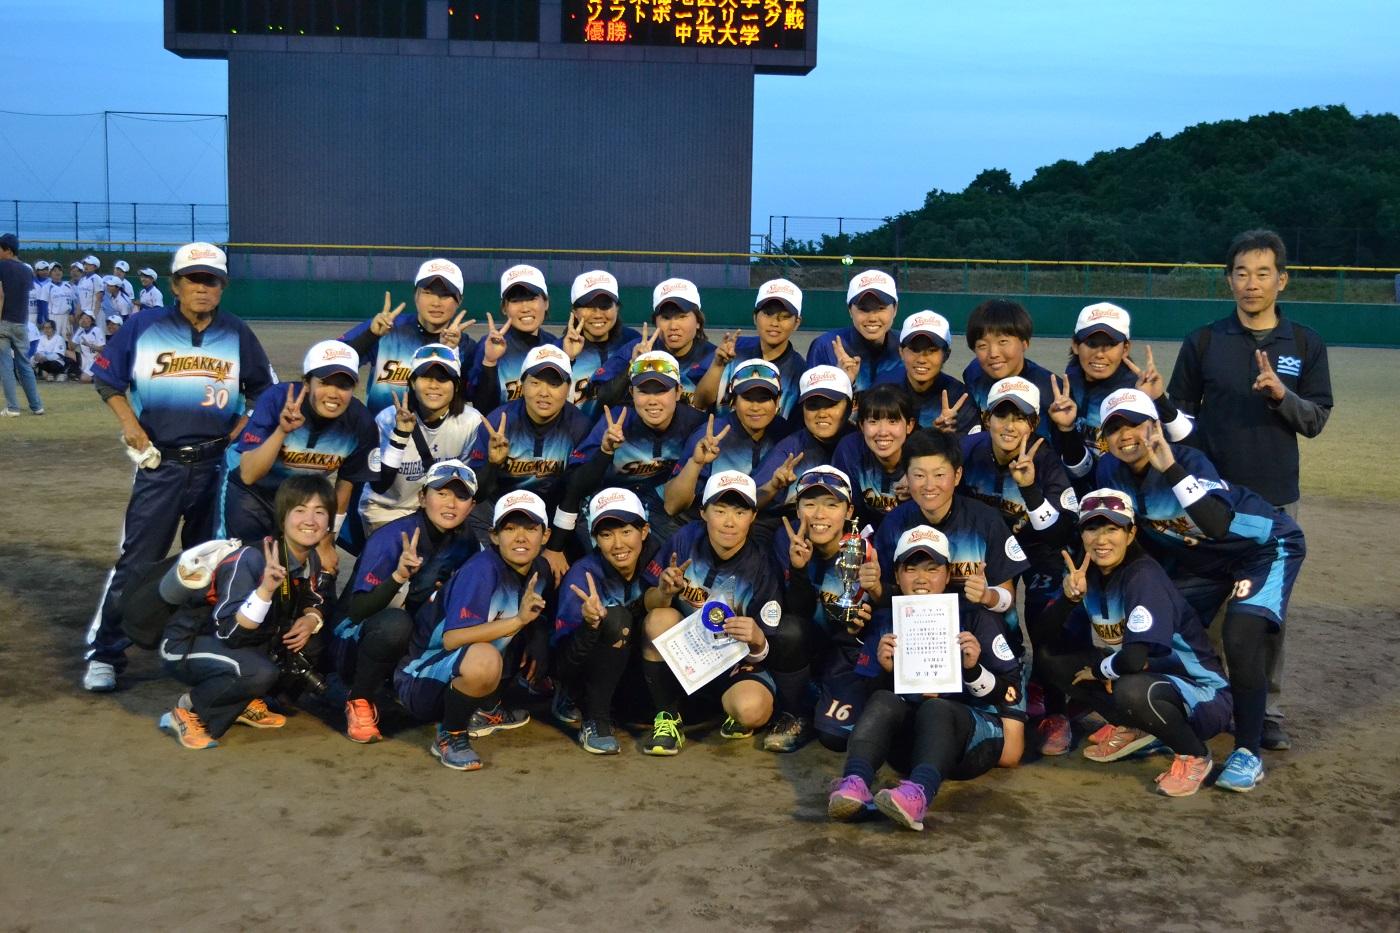 20180511_softball.JPG